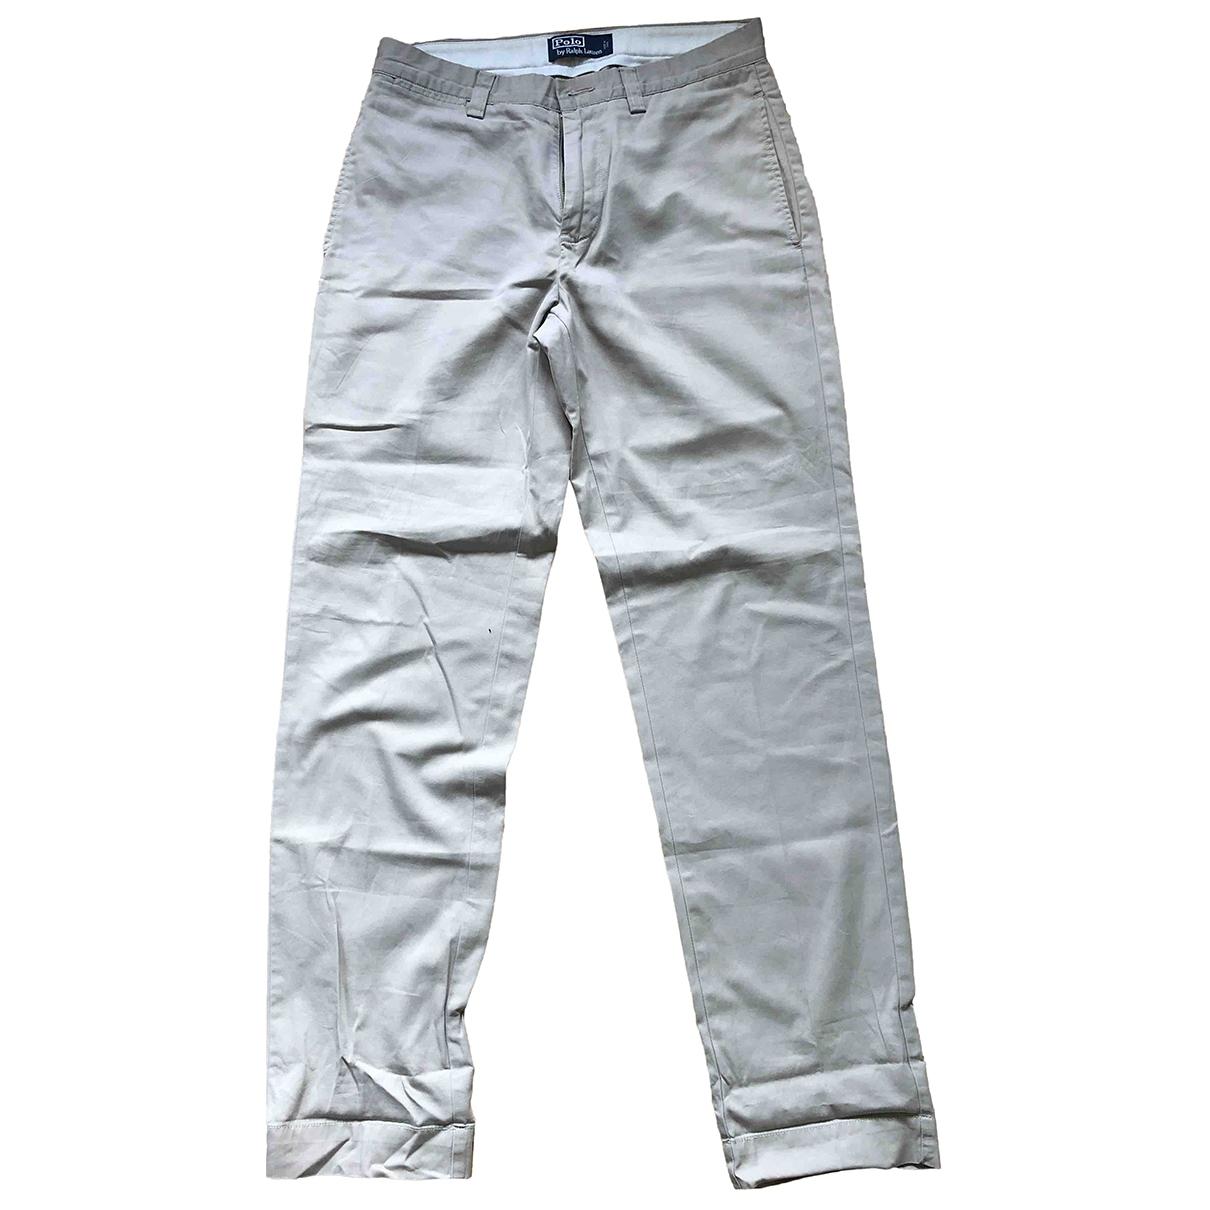 Polo Ralph Lauren \N Khaki Cotton Trousers for Men 30 UK - US